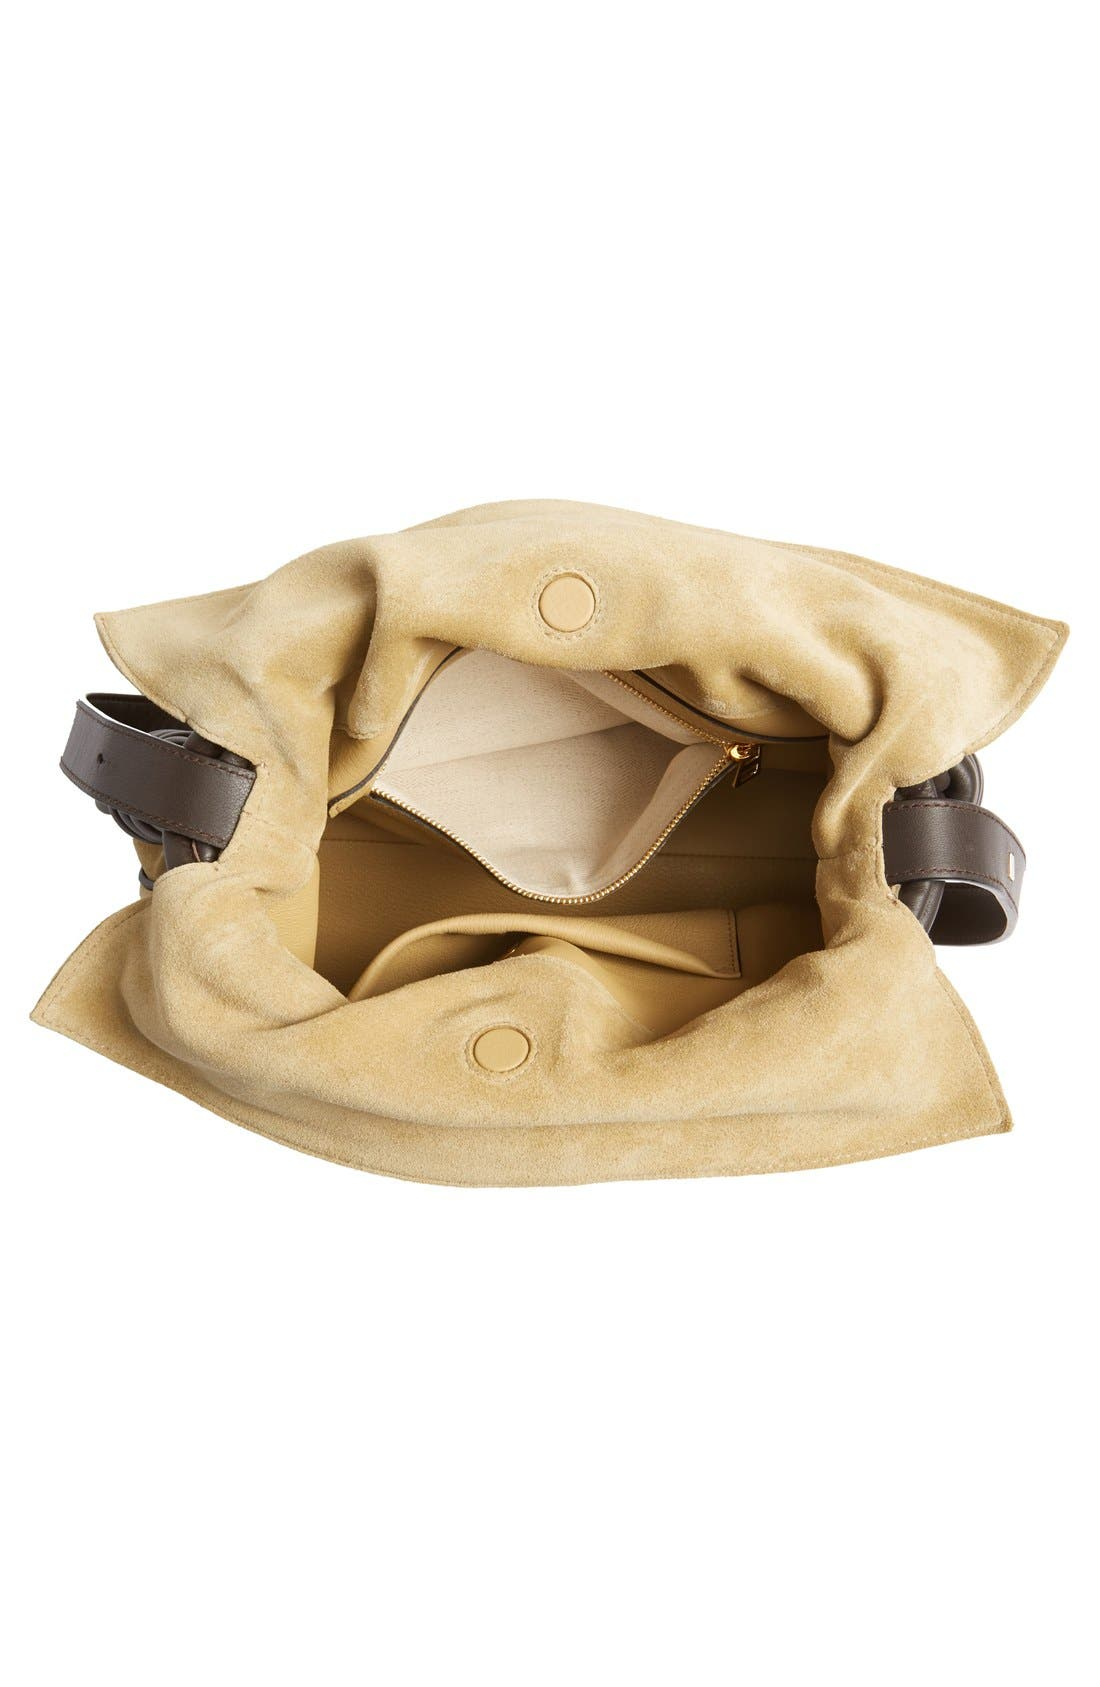 'Flamenco Knot' Suede & Calfskin Leather Bag,                             Alternate thumbnail 2, color,                             250